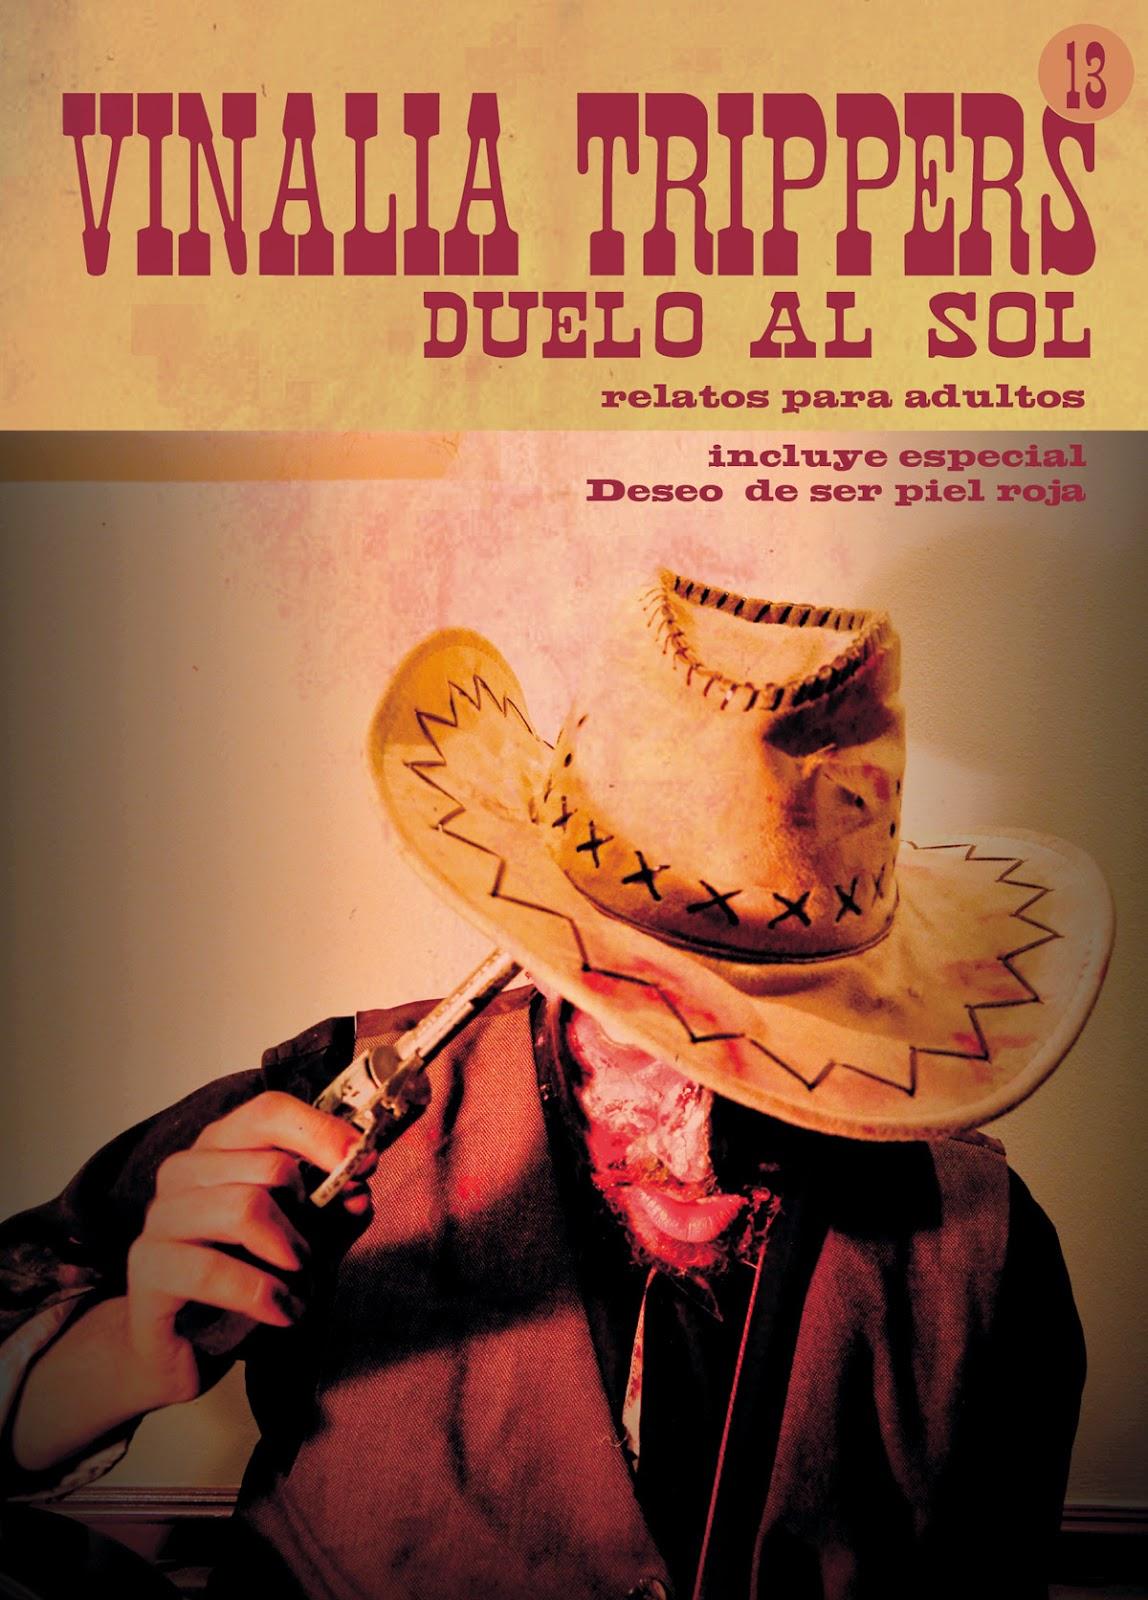 http://vinaliaplan9espacio.blogspot.com.es/2014/10/portada-duelo-al-sol.html